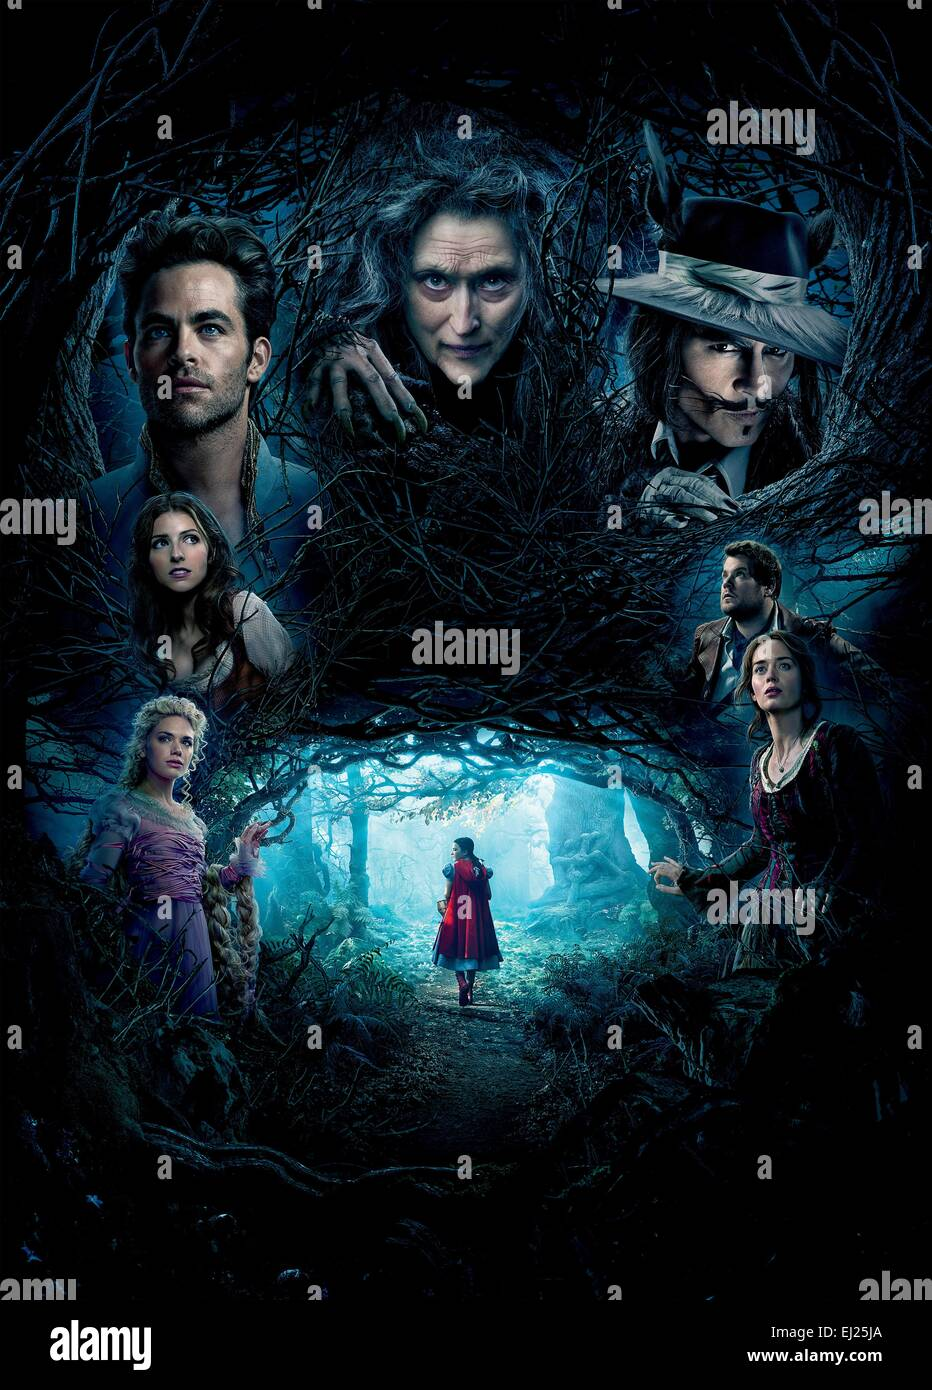 Into the Woods  Year : 2014 USA Director : Rob Marshall Mackenzie Mauzy, Anna Kendrick, Chris Pine, Meryl Streep, - Stock Image